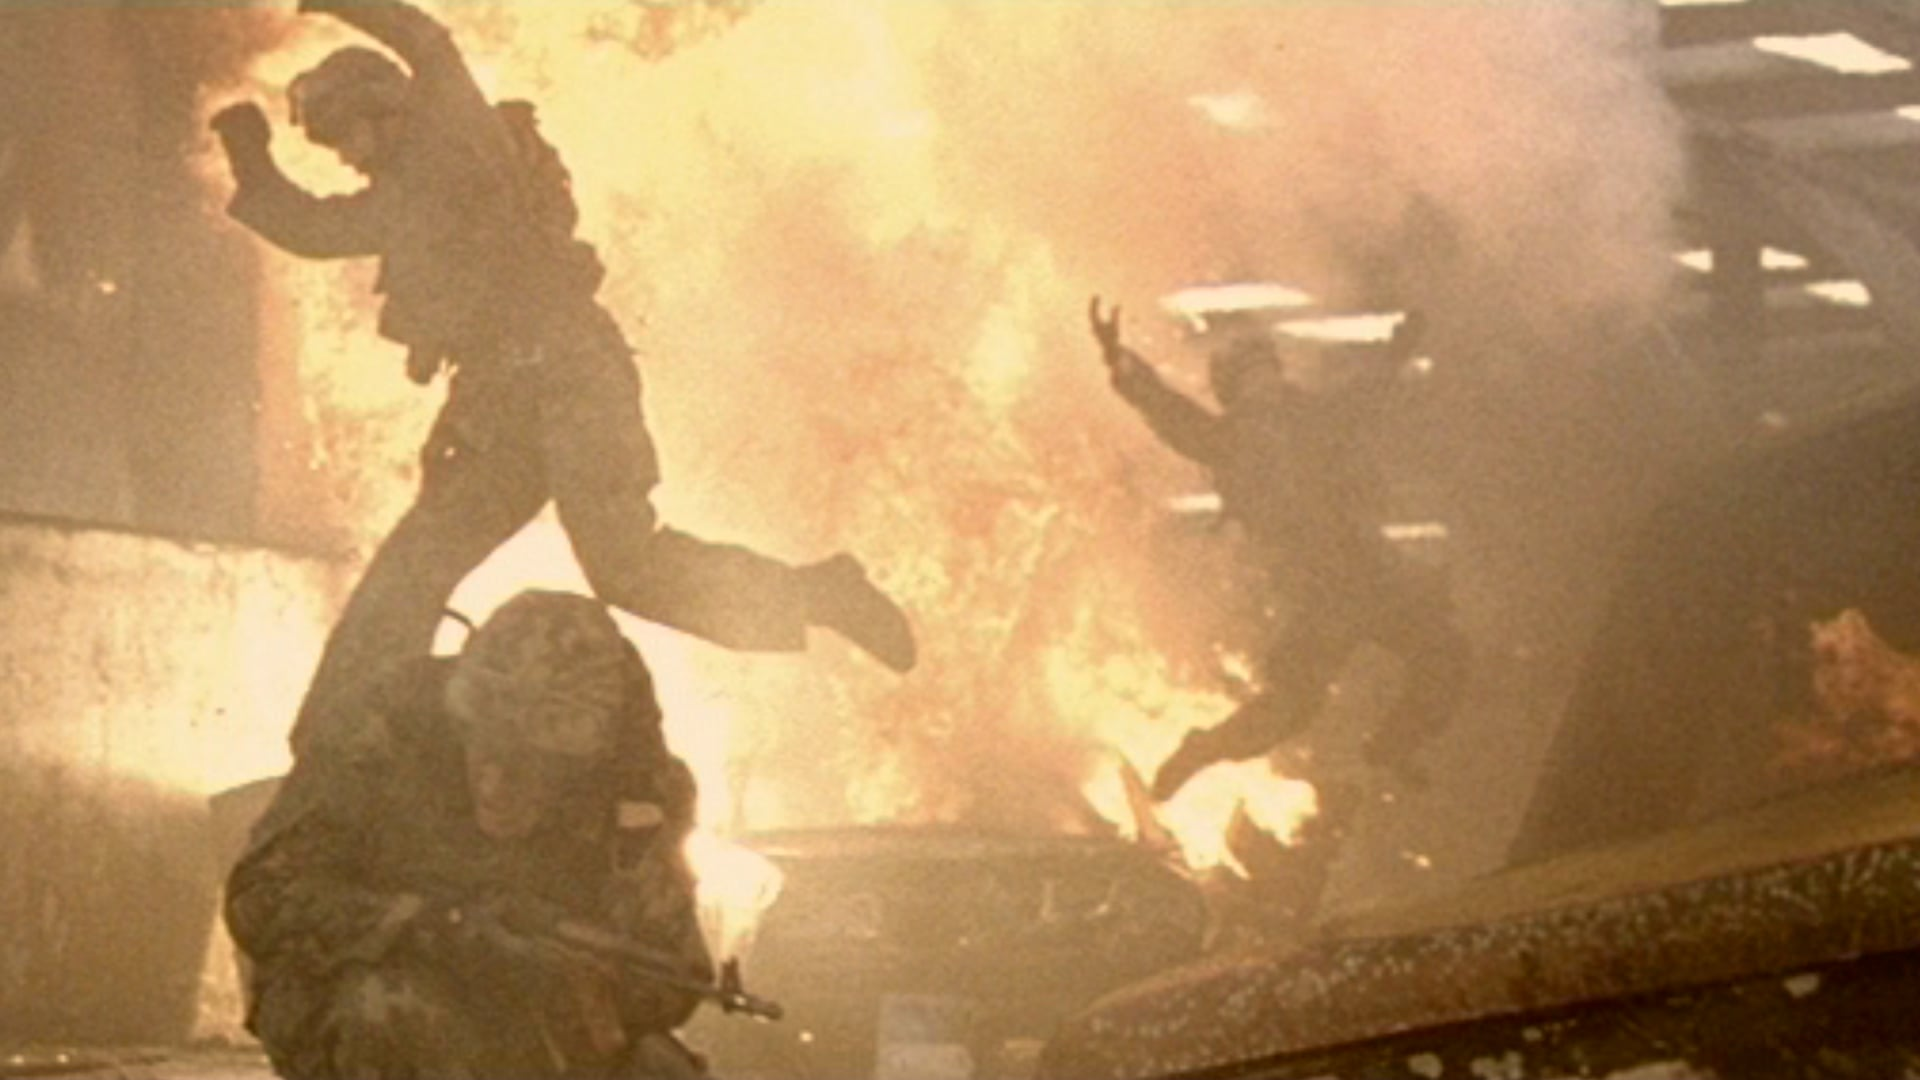 Ursus Stuntman